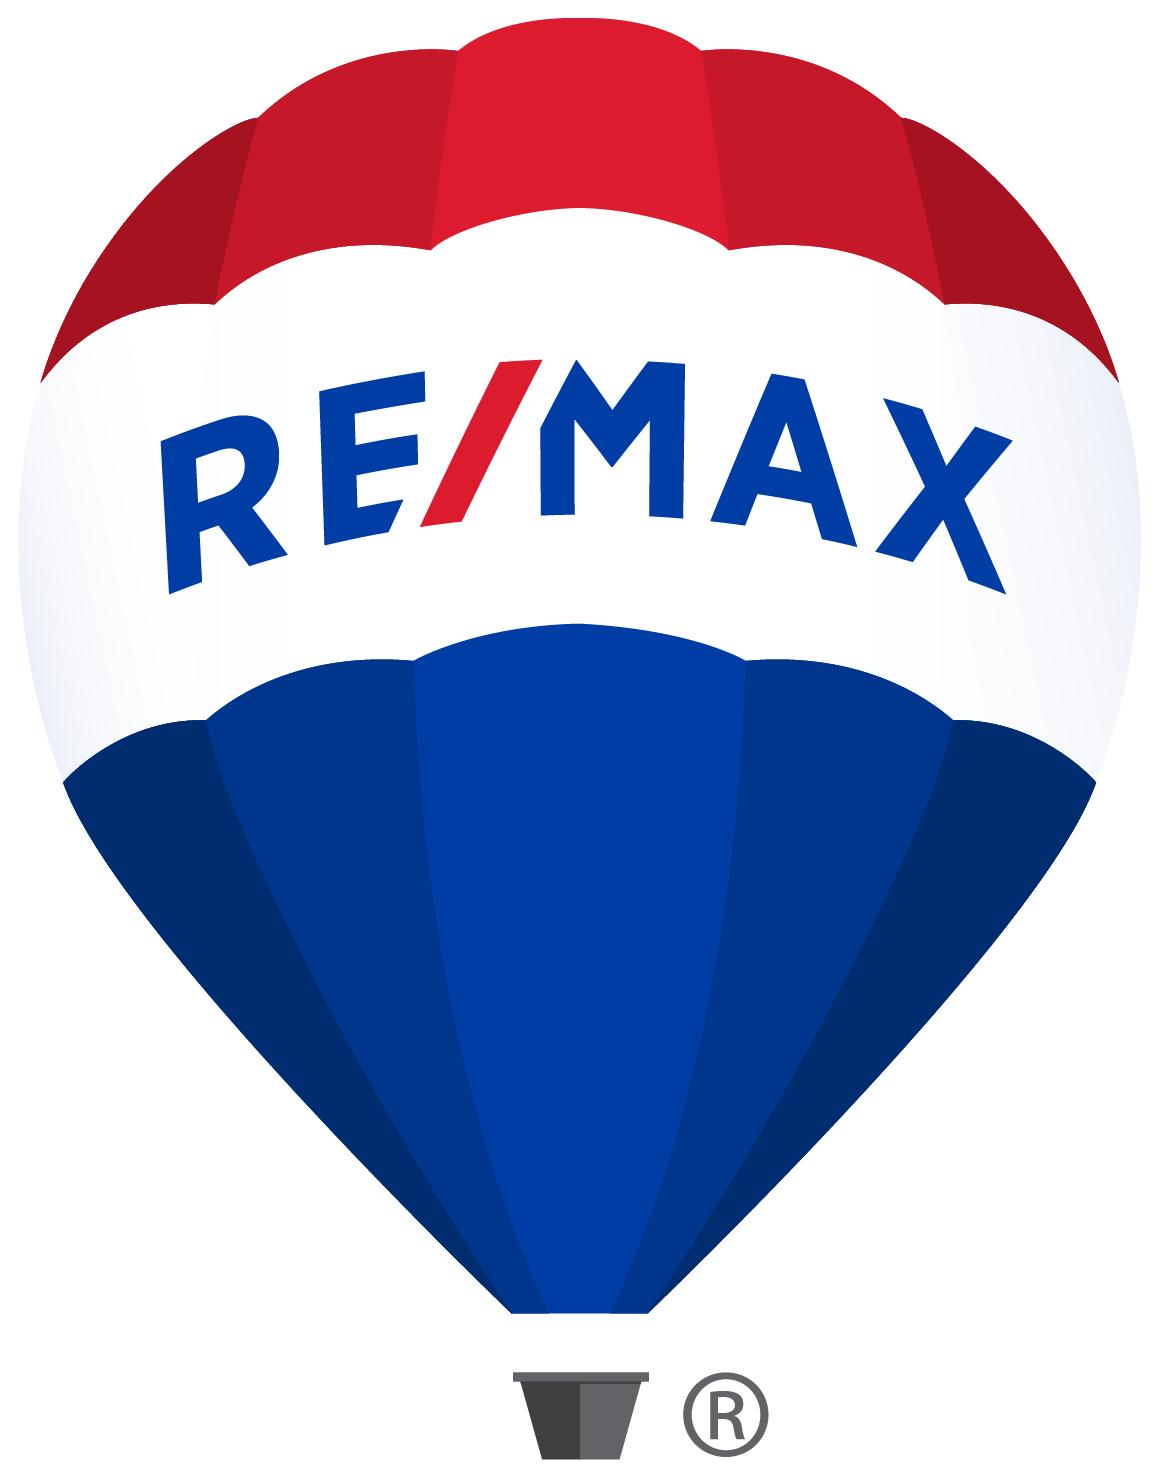 REMAX-balloon-joshua-elliott-kelowna-real-estate.png